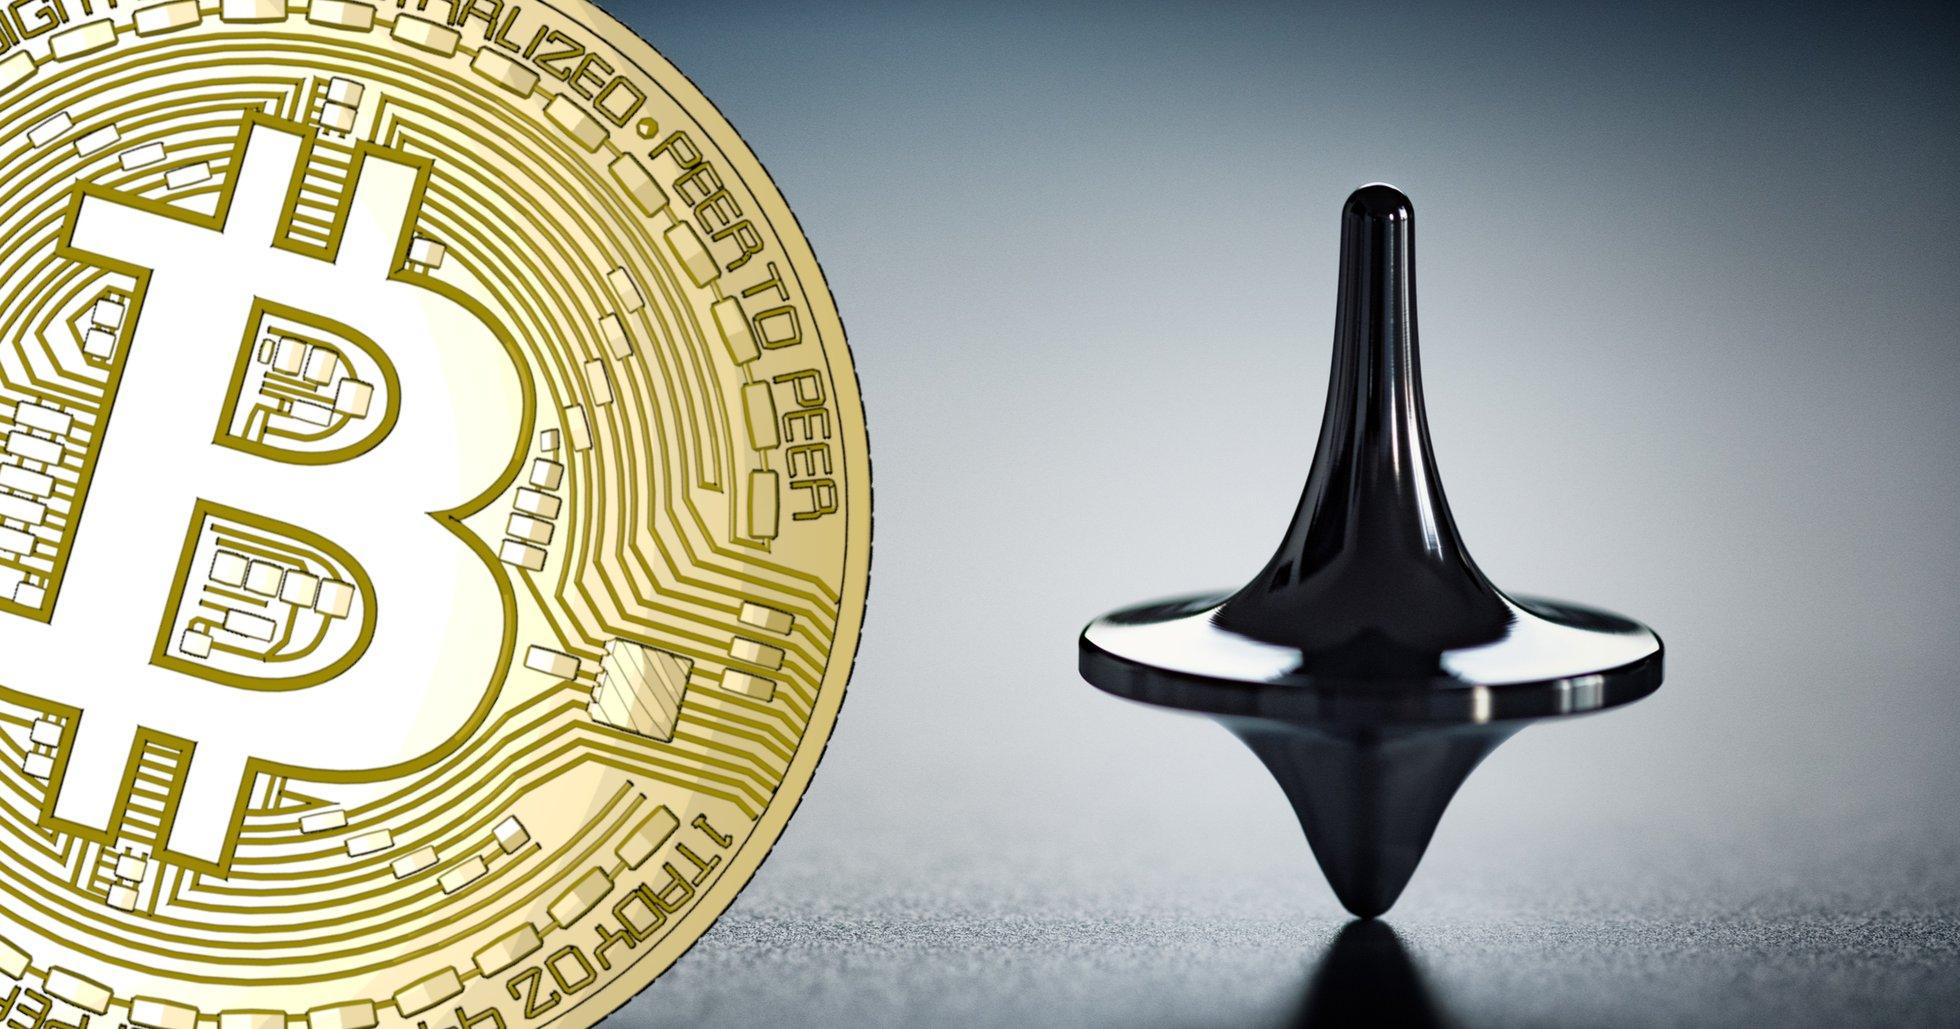 Bitcoinpriset svajigt kring 9 000 dollar.